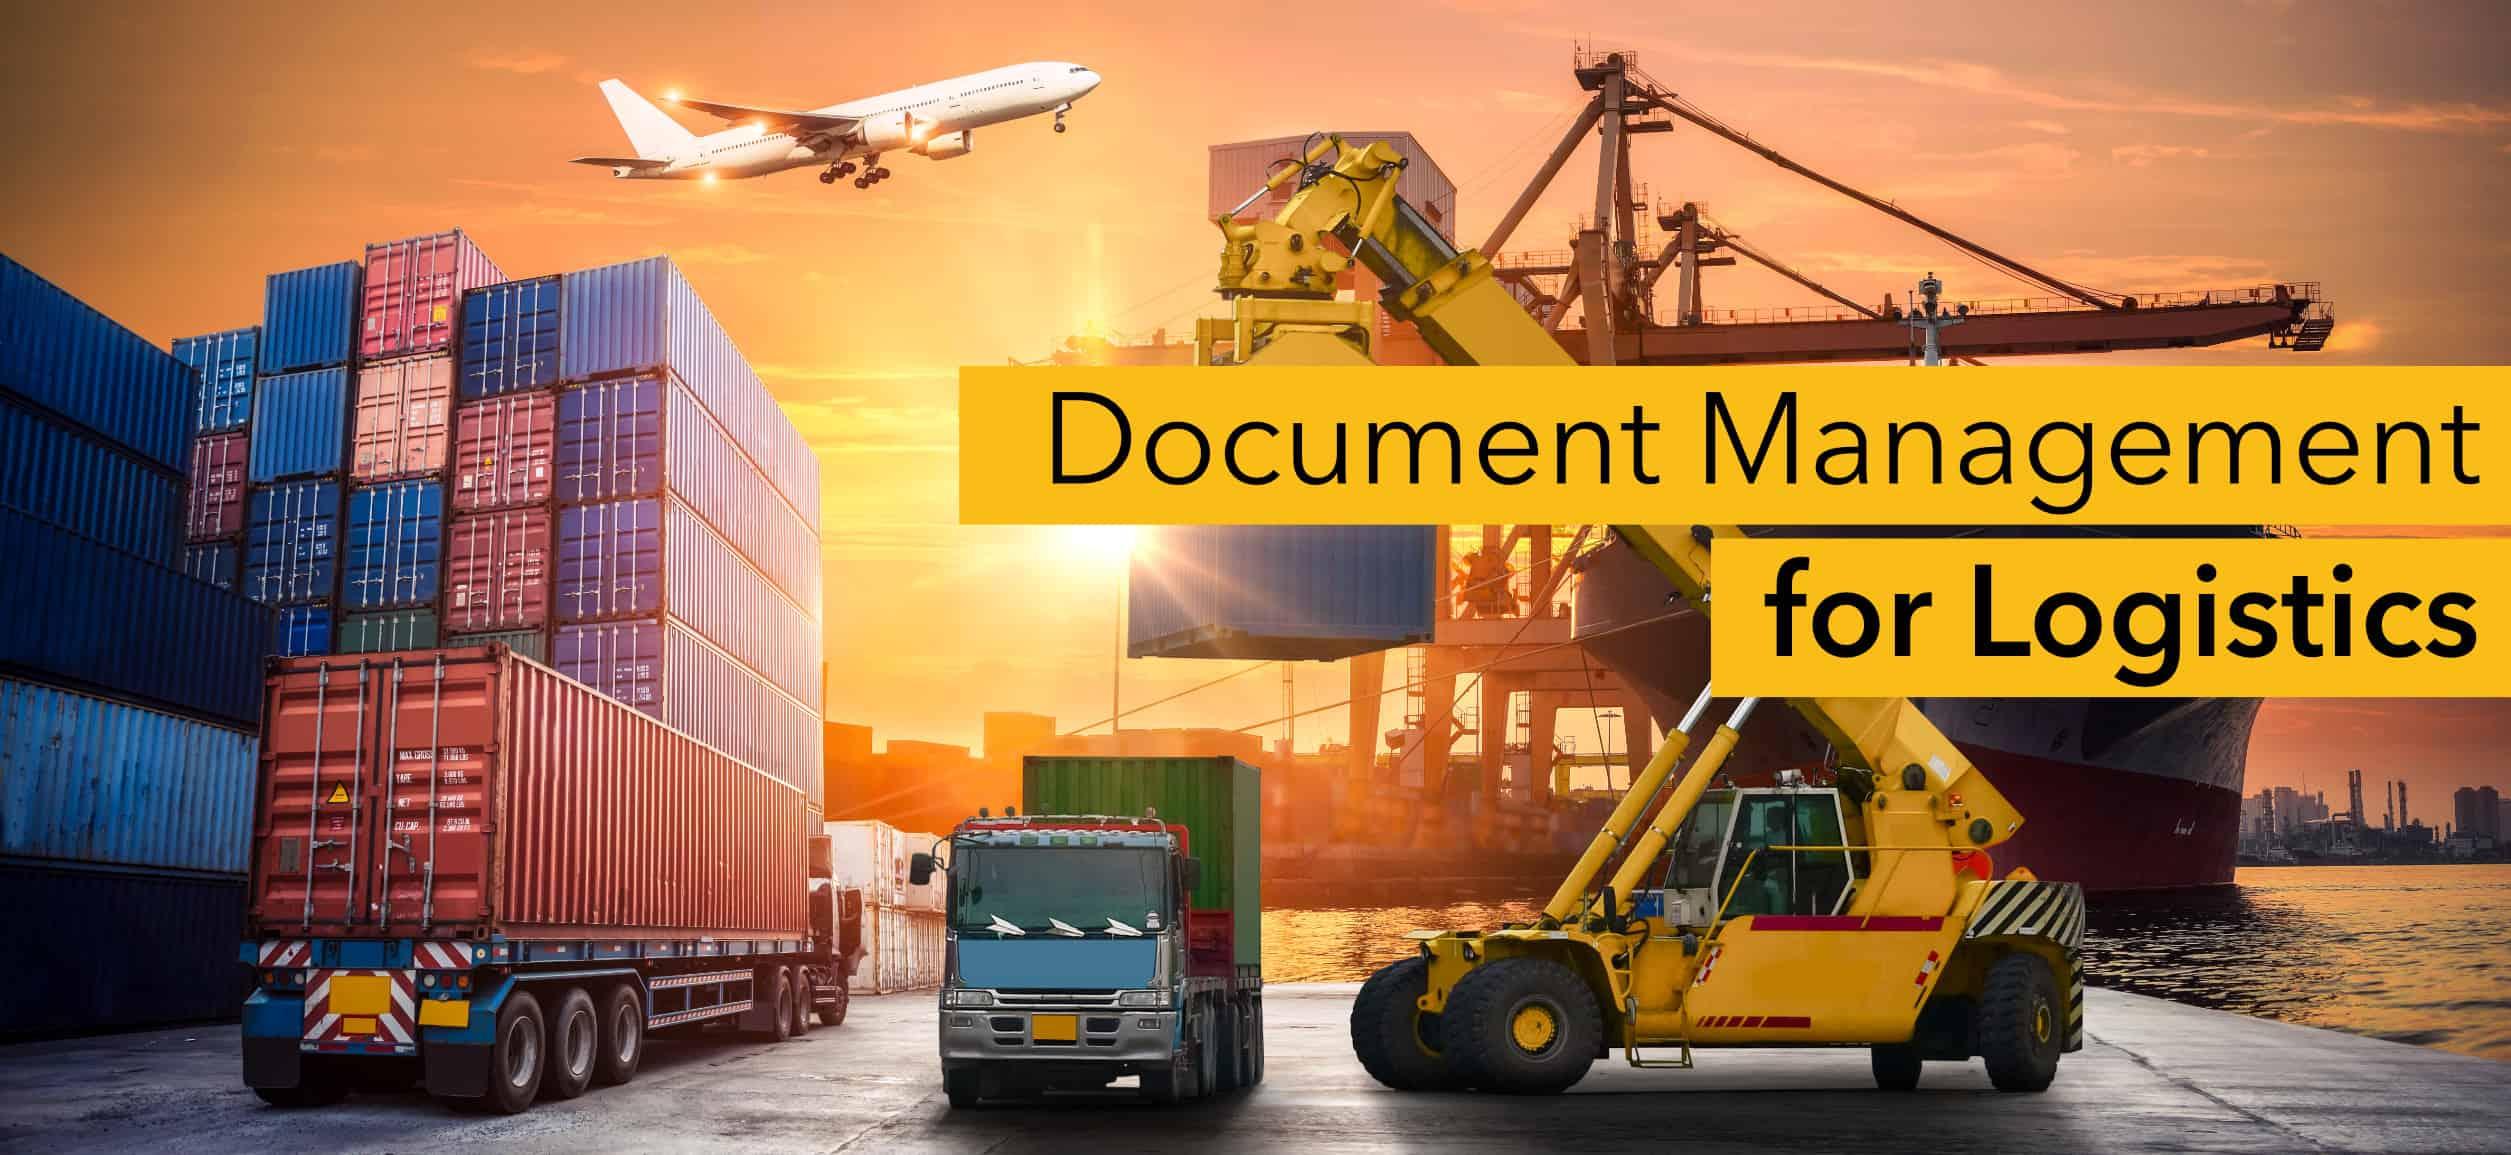 Document management for logistics